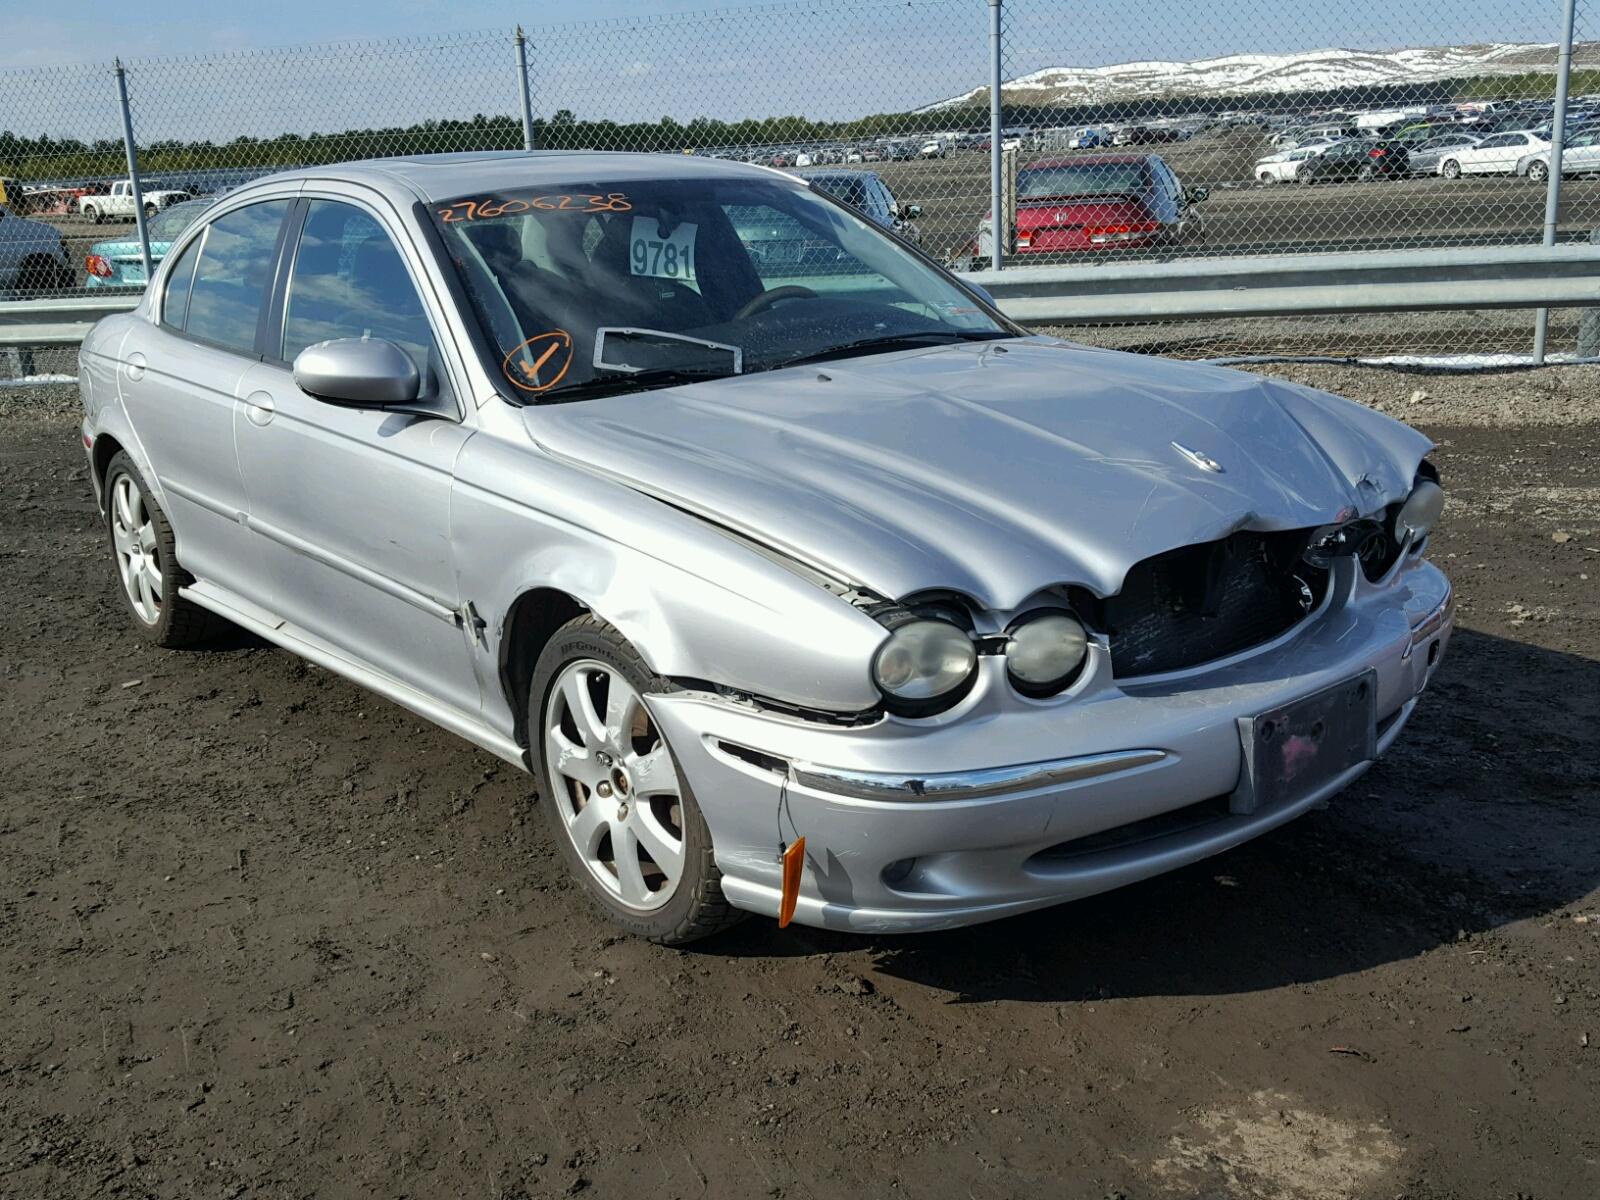 for sale pensacola cargurus x l in used cars fl jaguar type